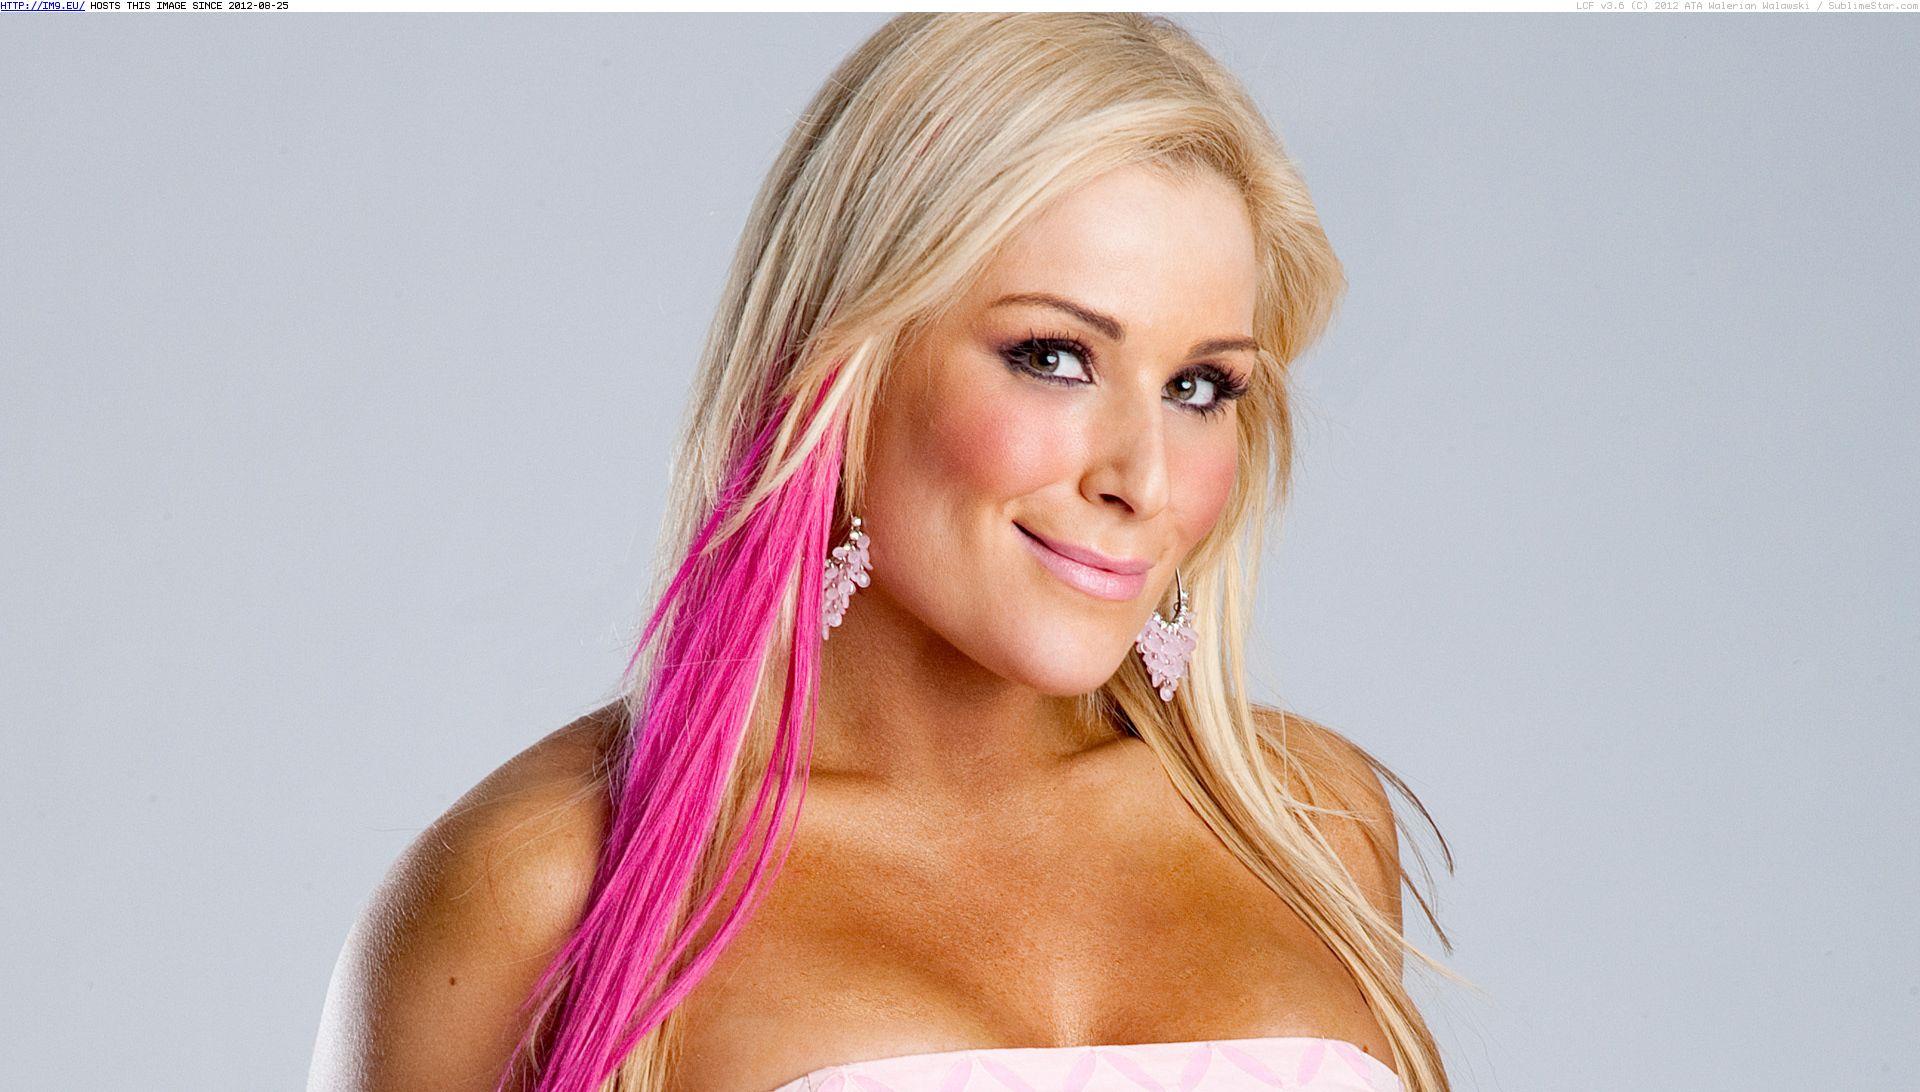 eu Image Hosting WWE Super Hot Divas Full HD Wallpapers natalya 1920x1092